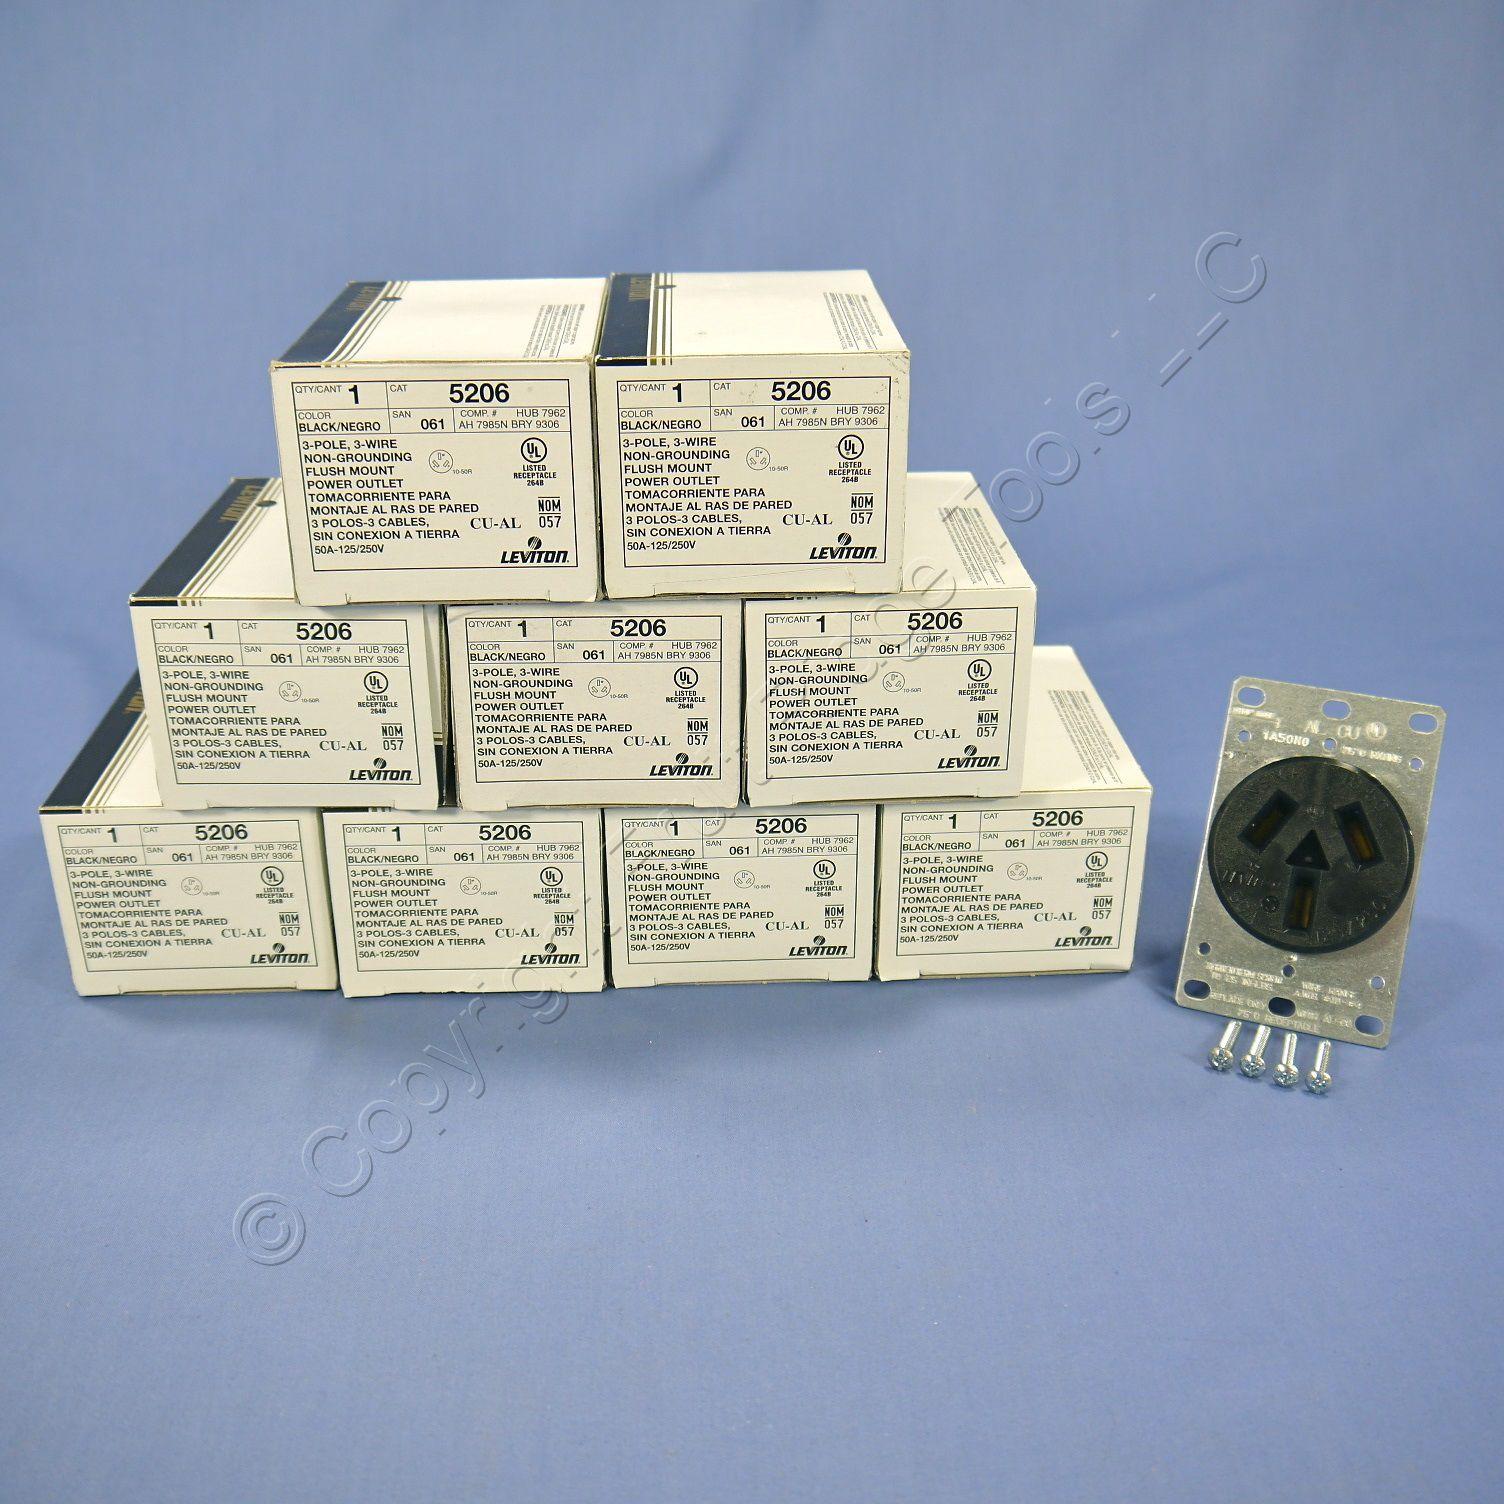 leviton 220v outlet wiring diagram nissan patrol 2003 stereo a 250v free engine image for user